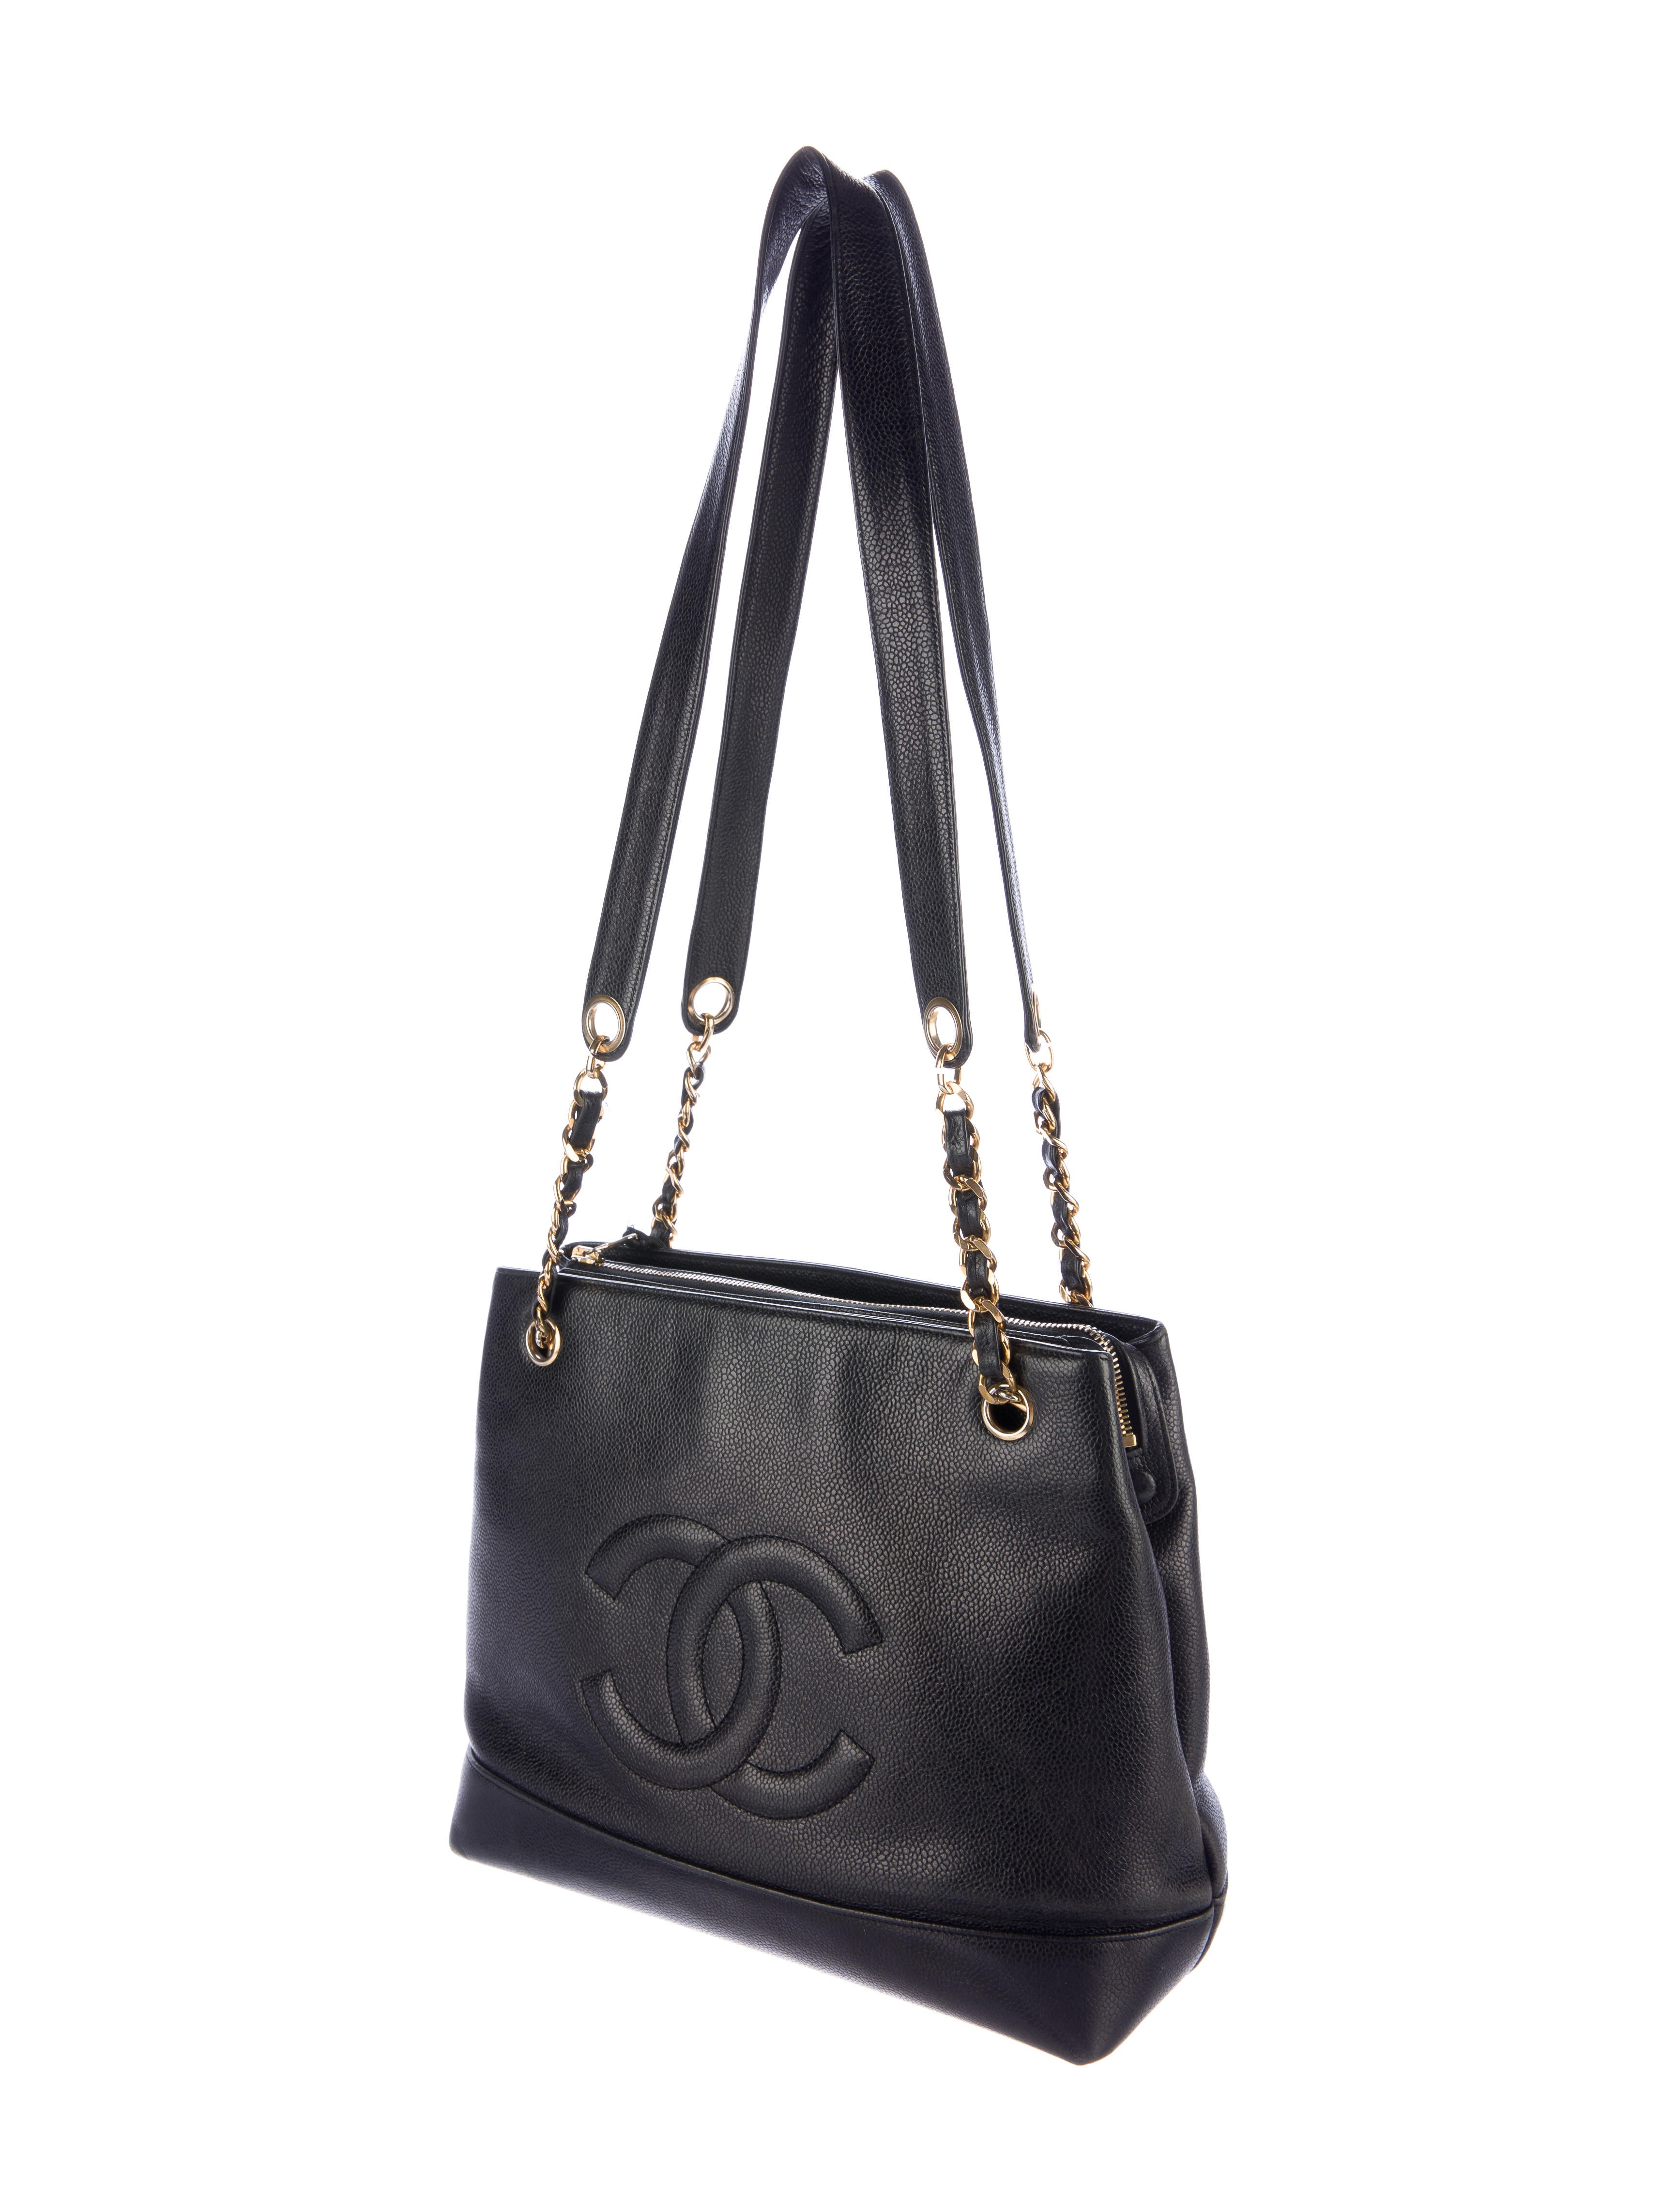 Chanel Caviar Timeless Shoulder Bag - Handbags